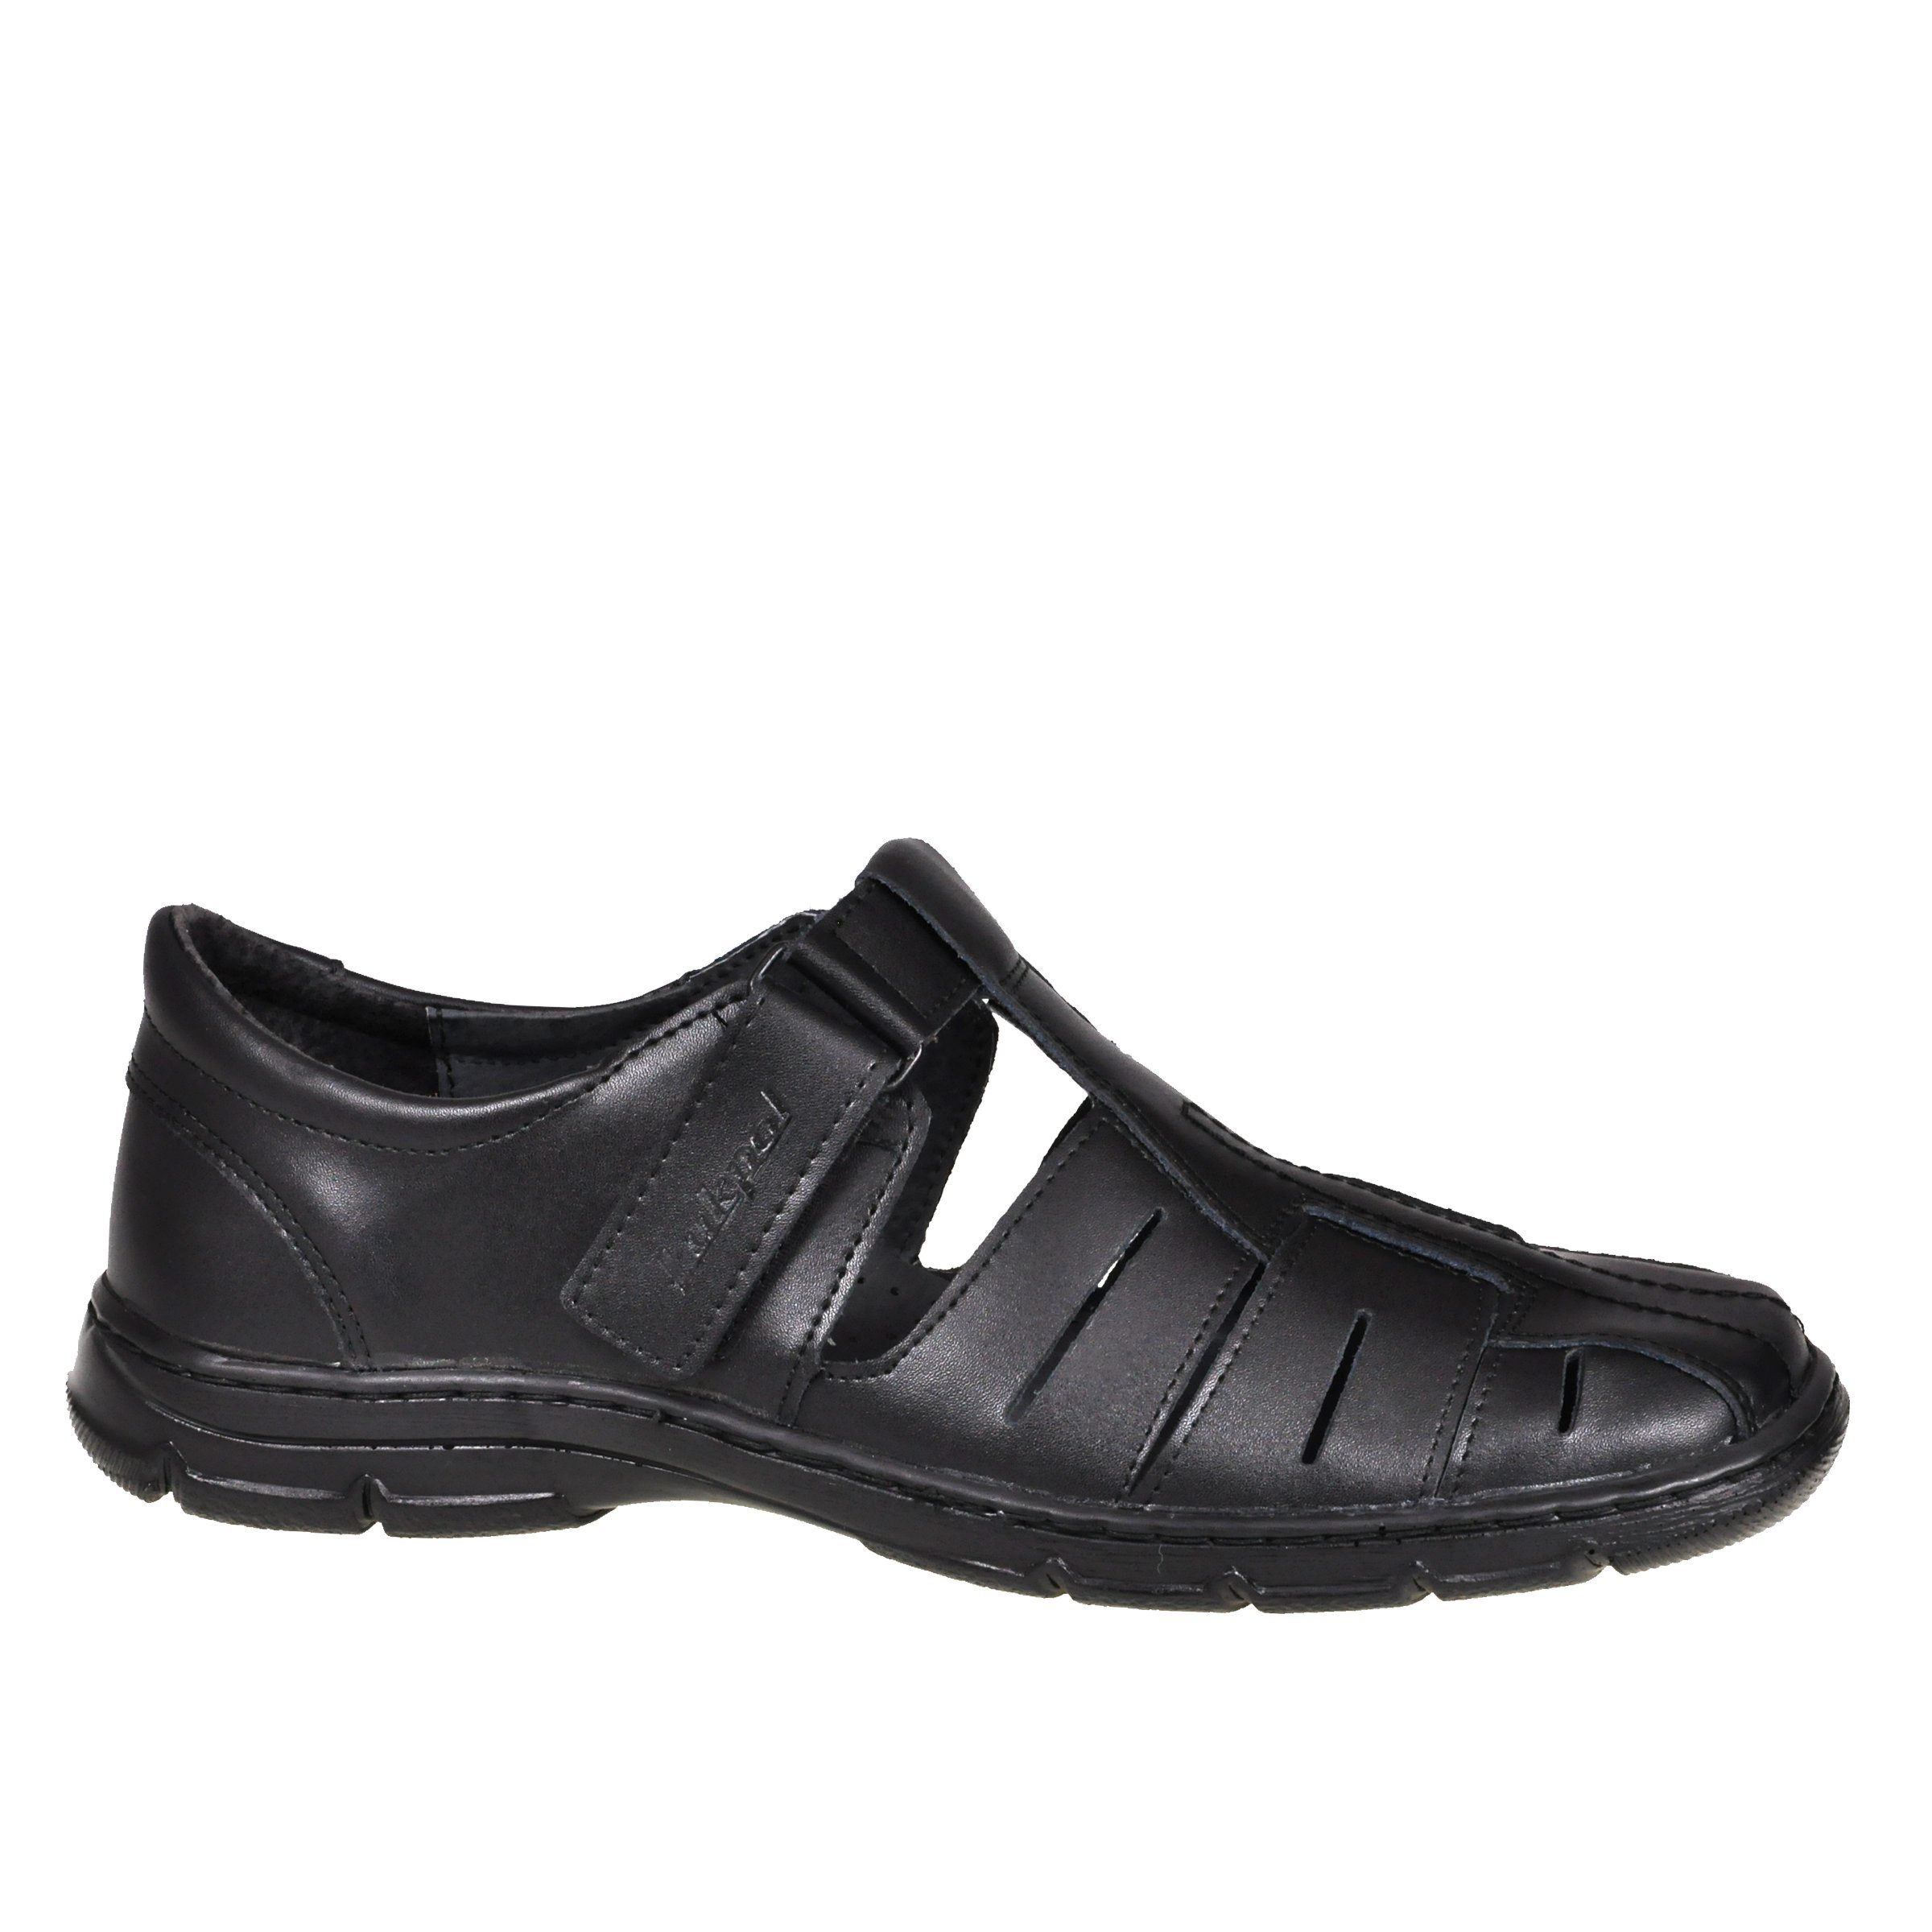 Lukpol Mens Orthopedic Form Buffalo Leather Sandals Model-1062